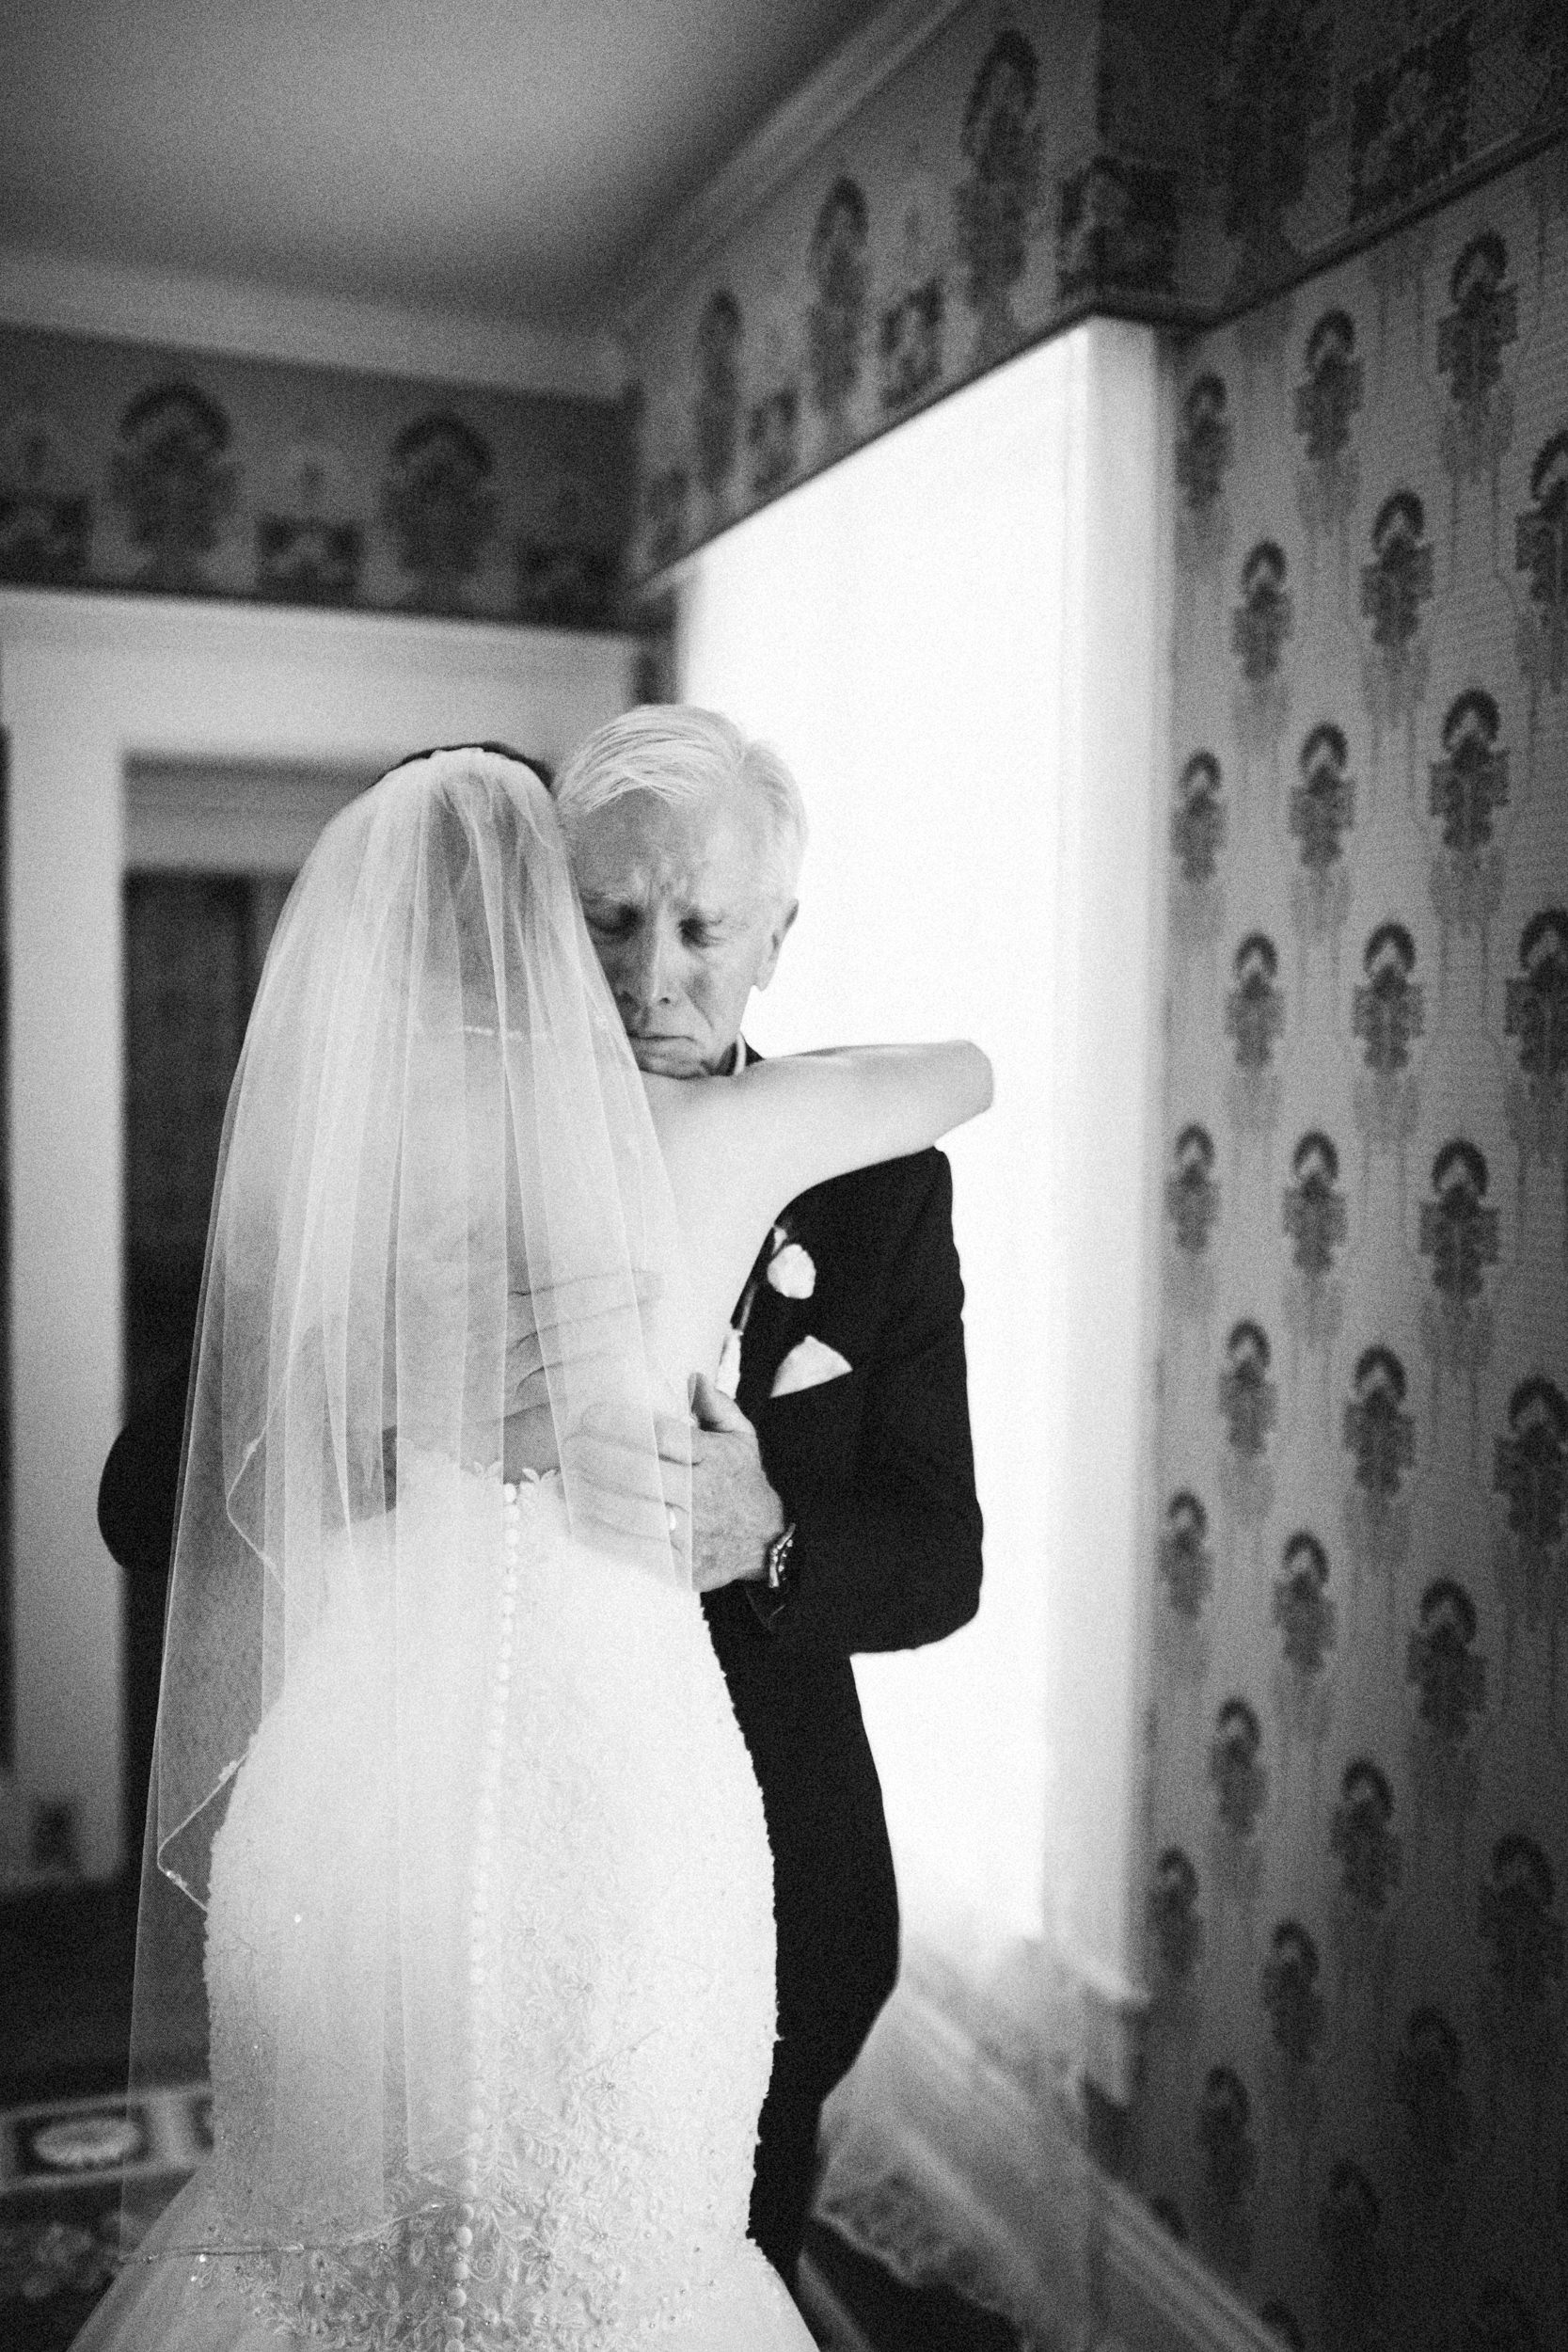 Louisville-Kentucky-Wedding-Elopement-Photographer-Sarah-Katherine-Davis-Photography-Whitehall-Classic-Timeless-Garden-Wedding-170.jpg